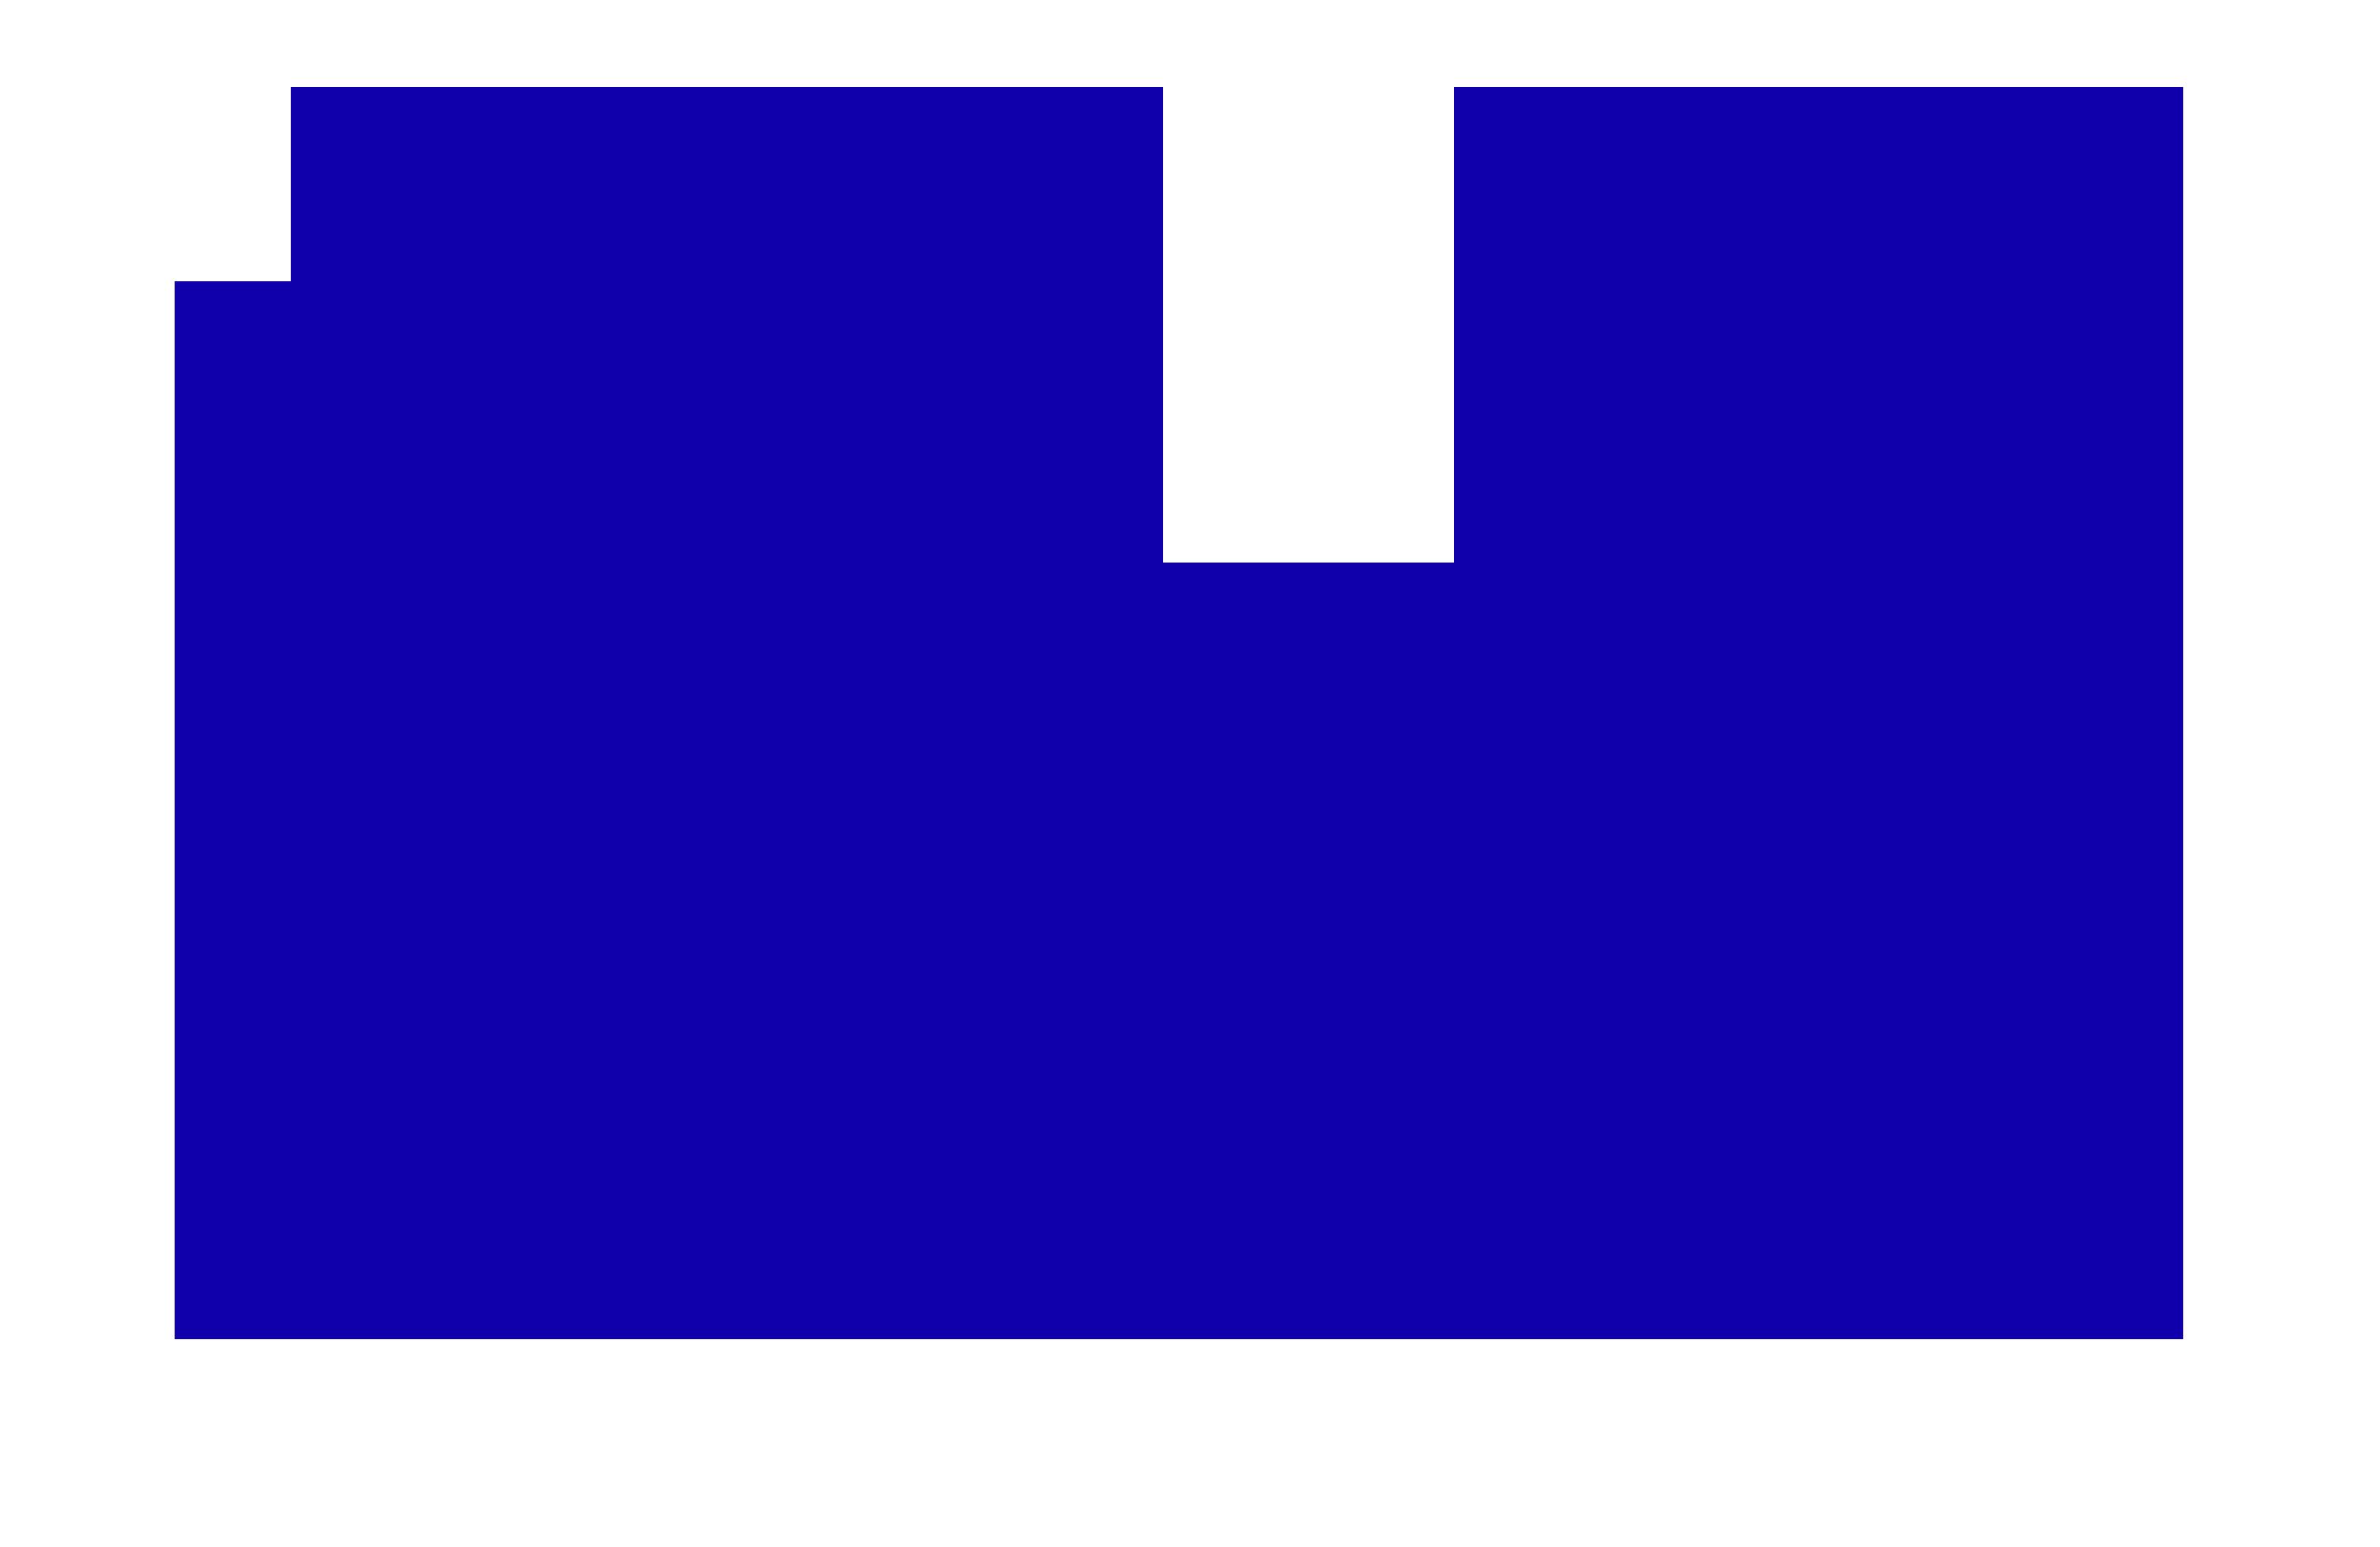 Amélie-Anne Calmo